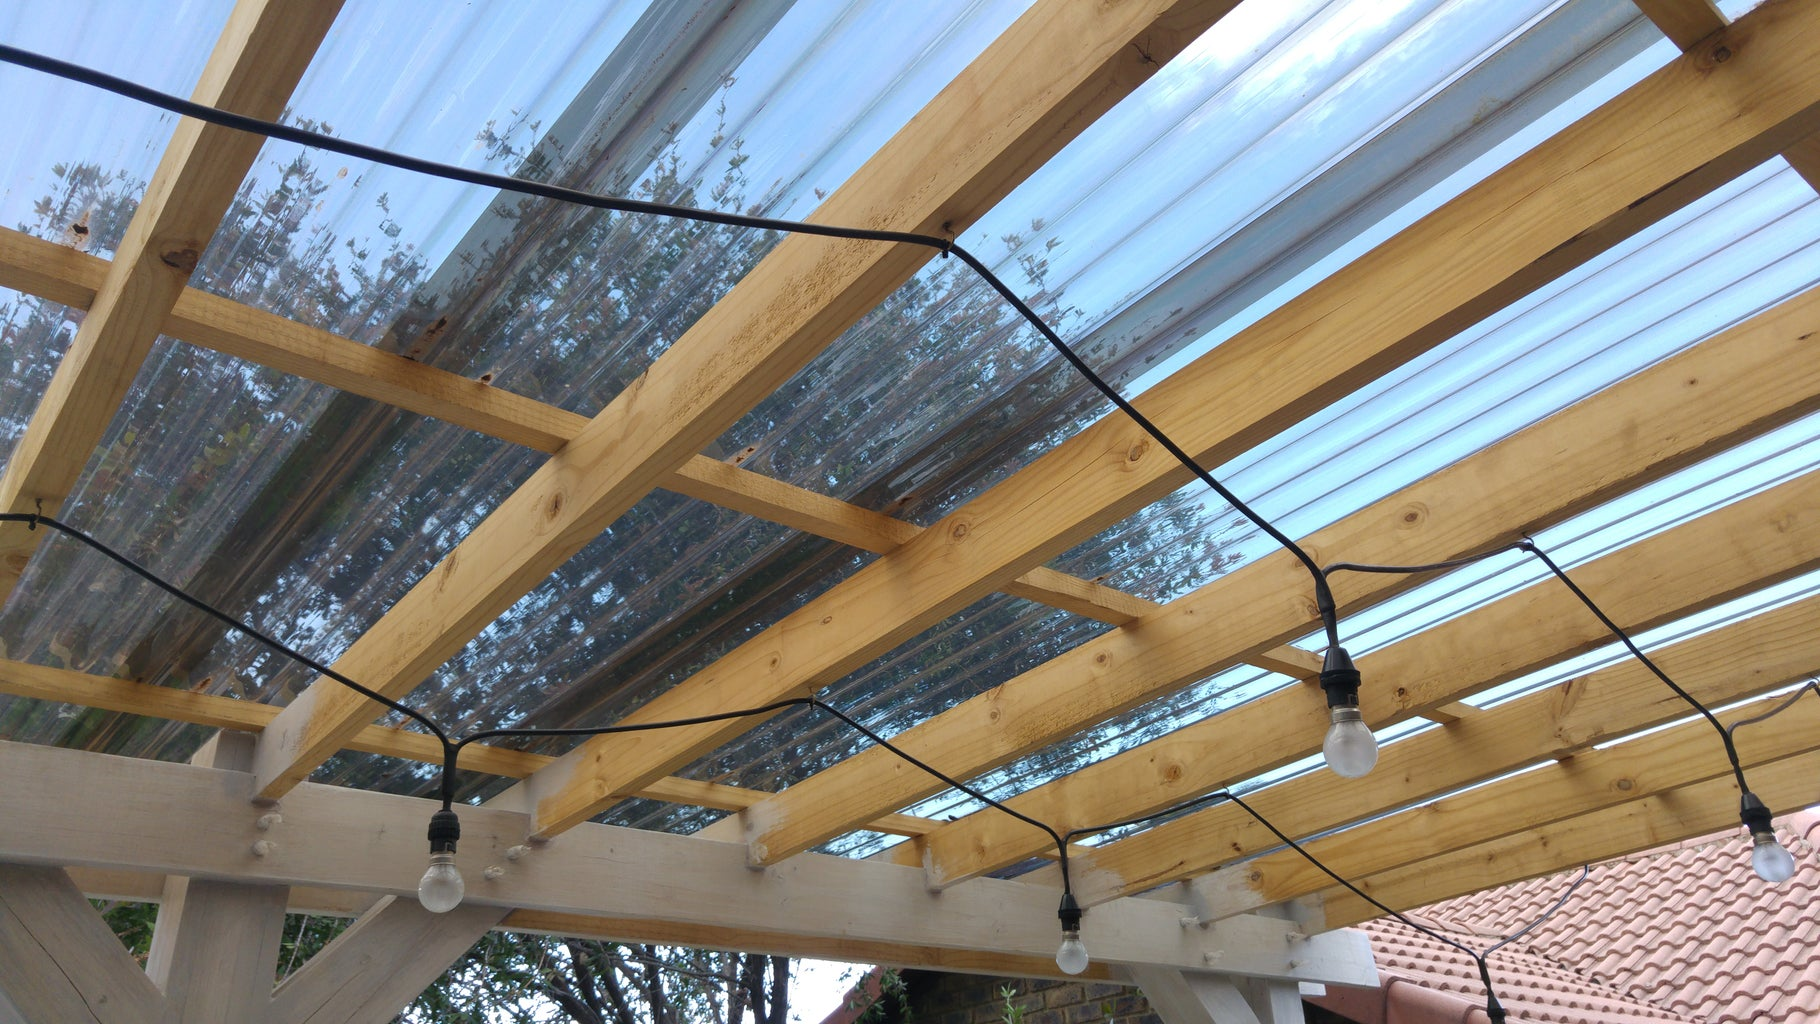 Covered Roof - Modek